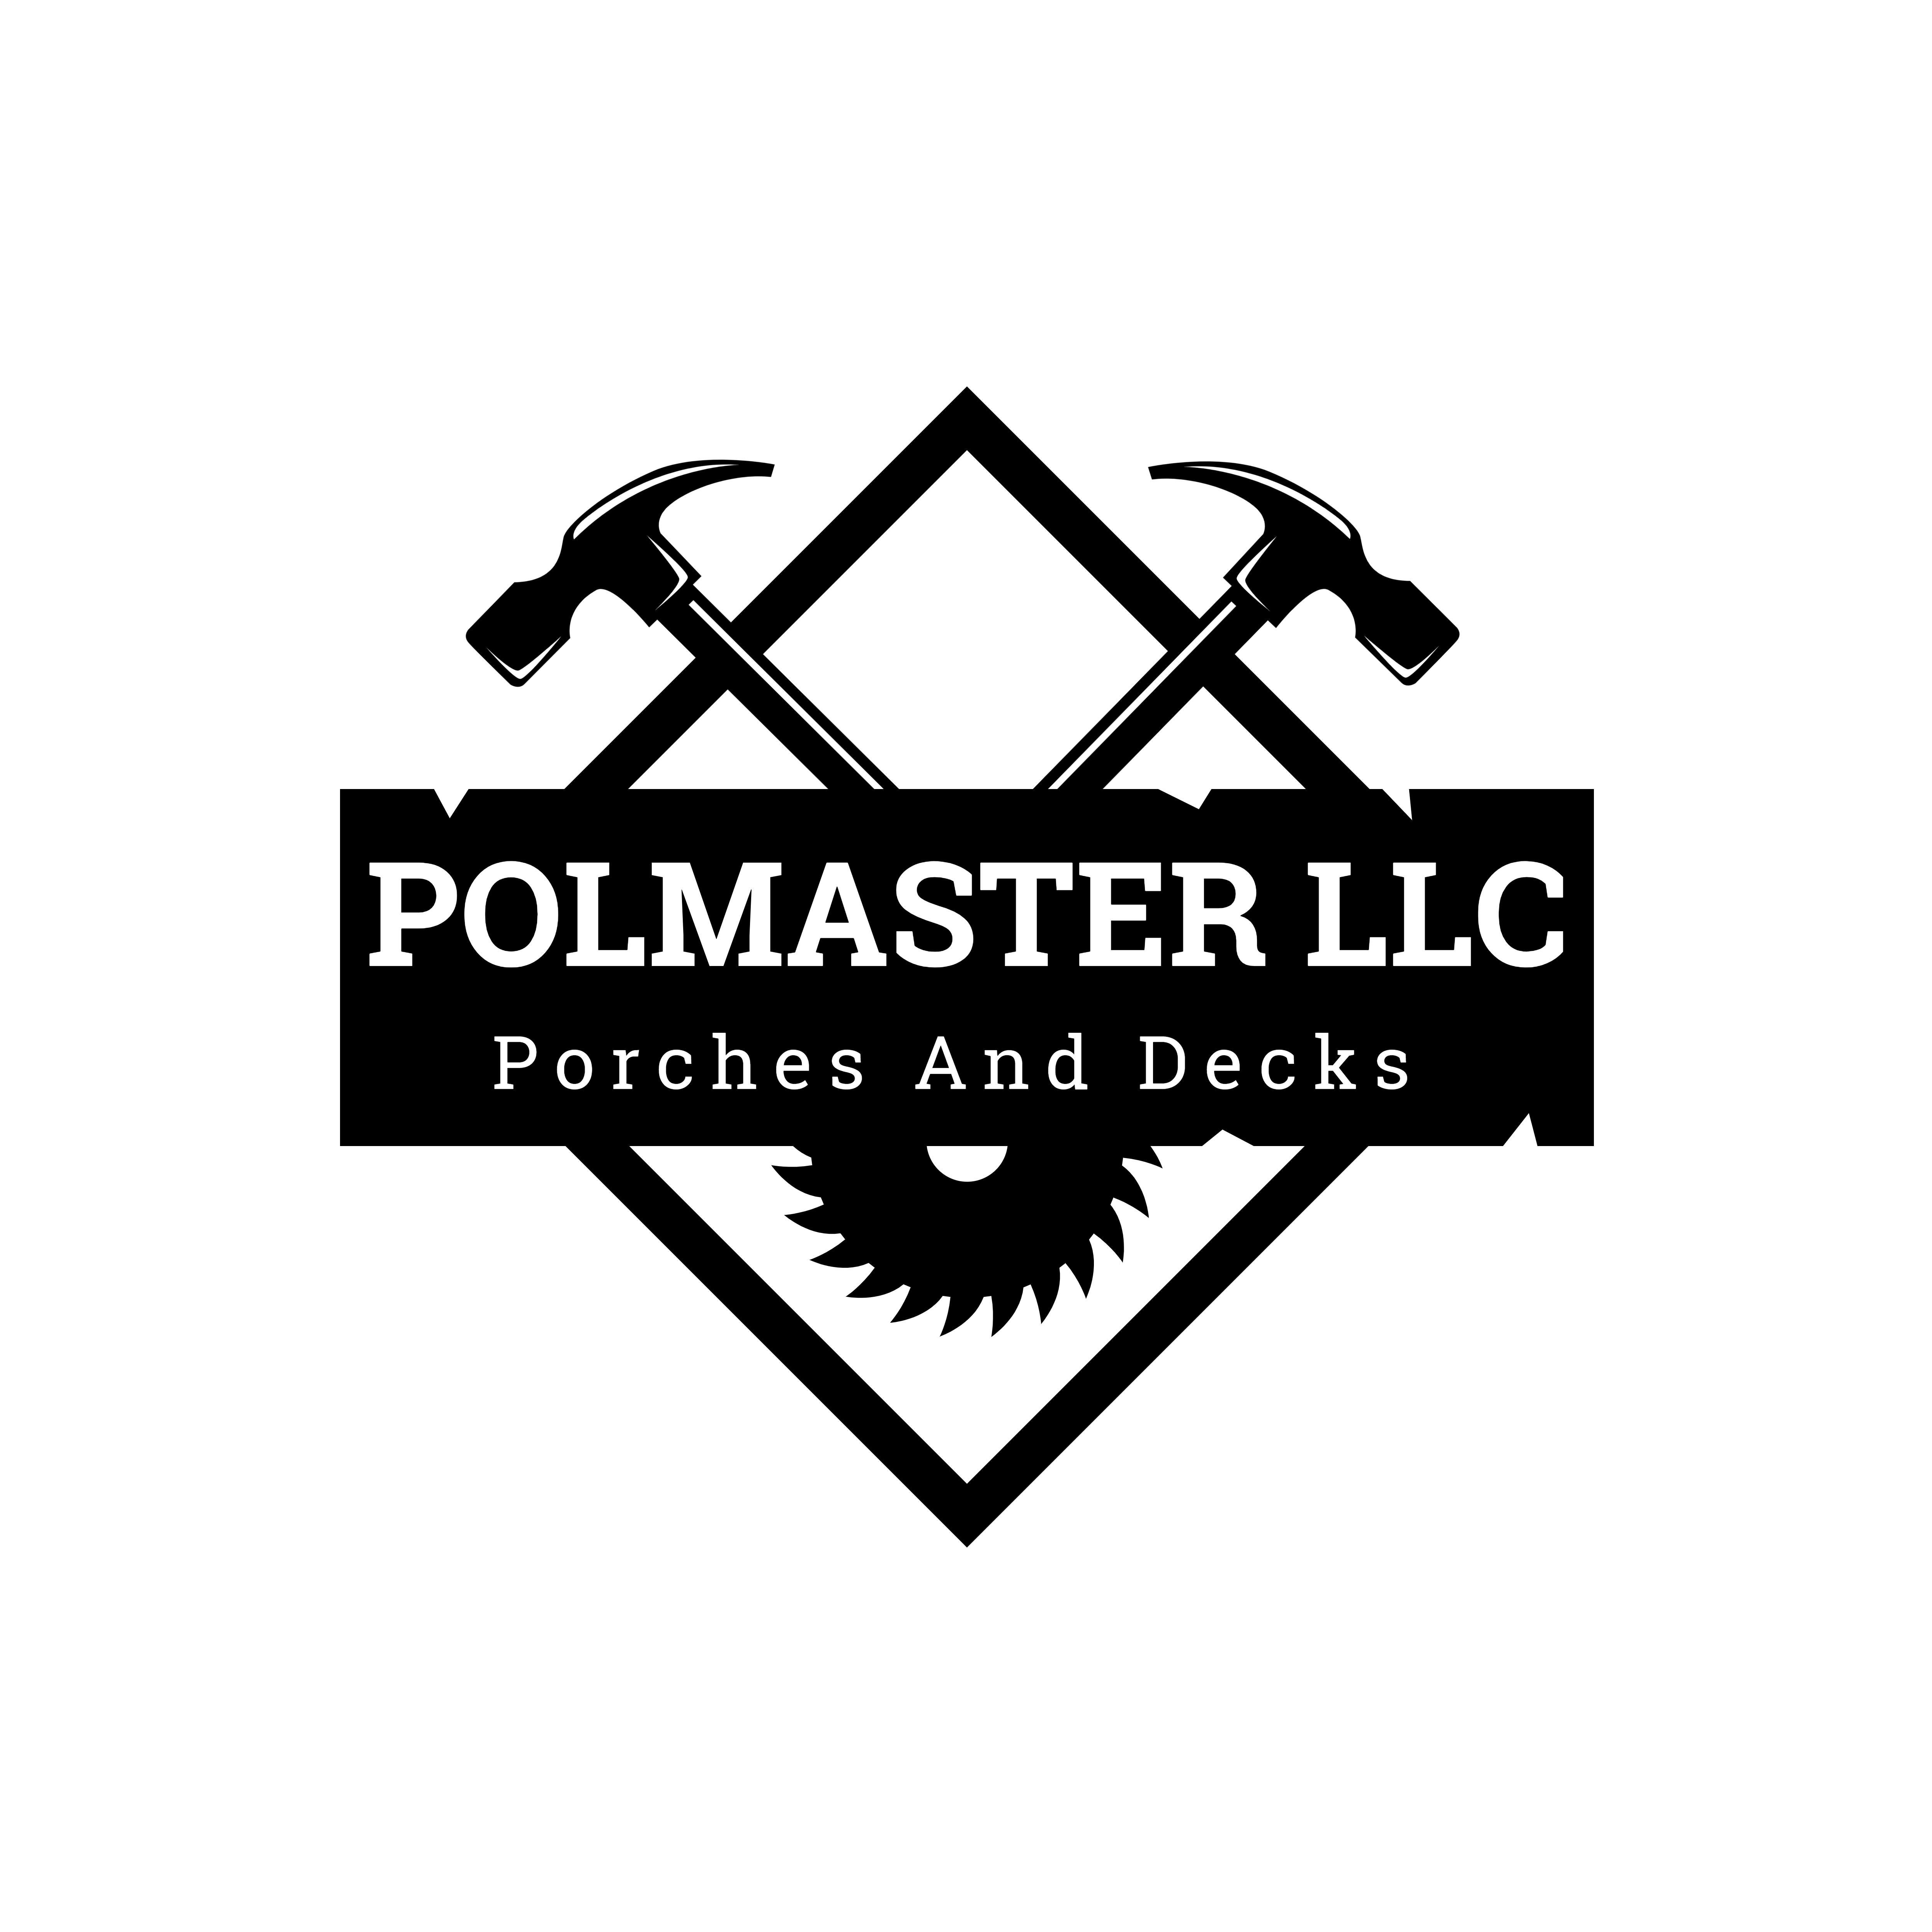 PolMasterLLC logo